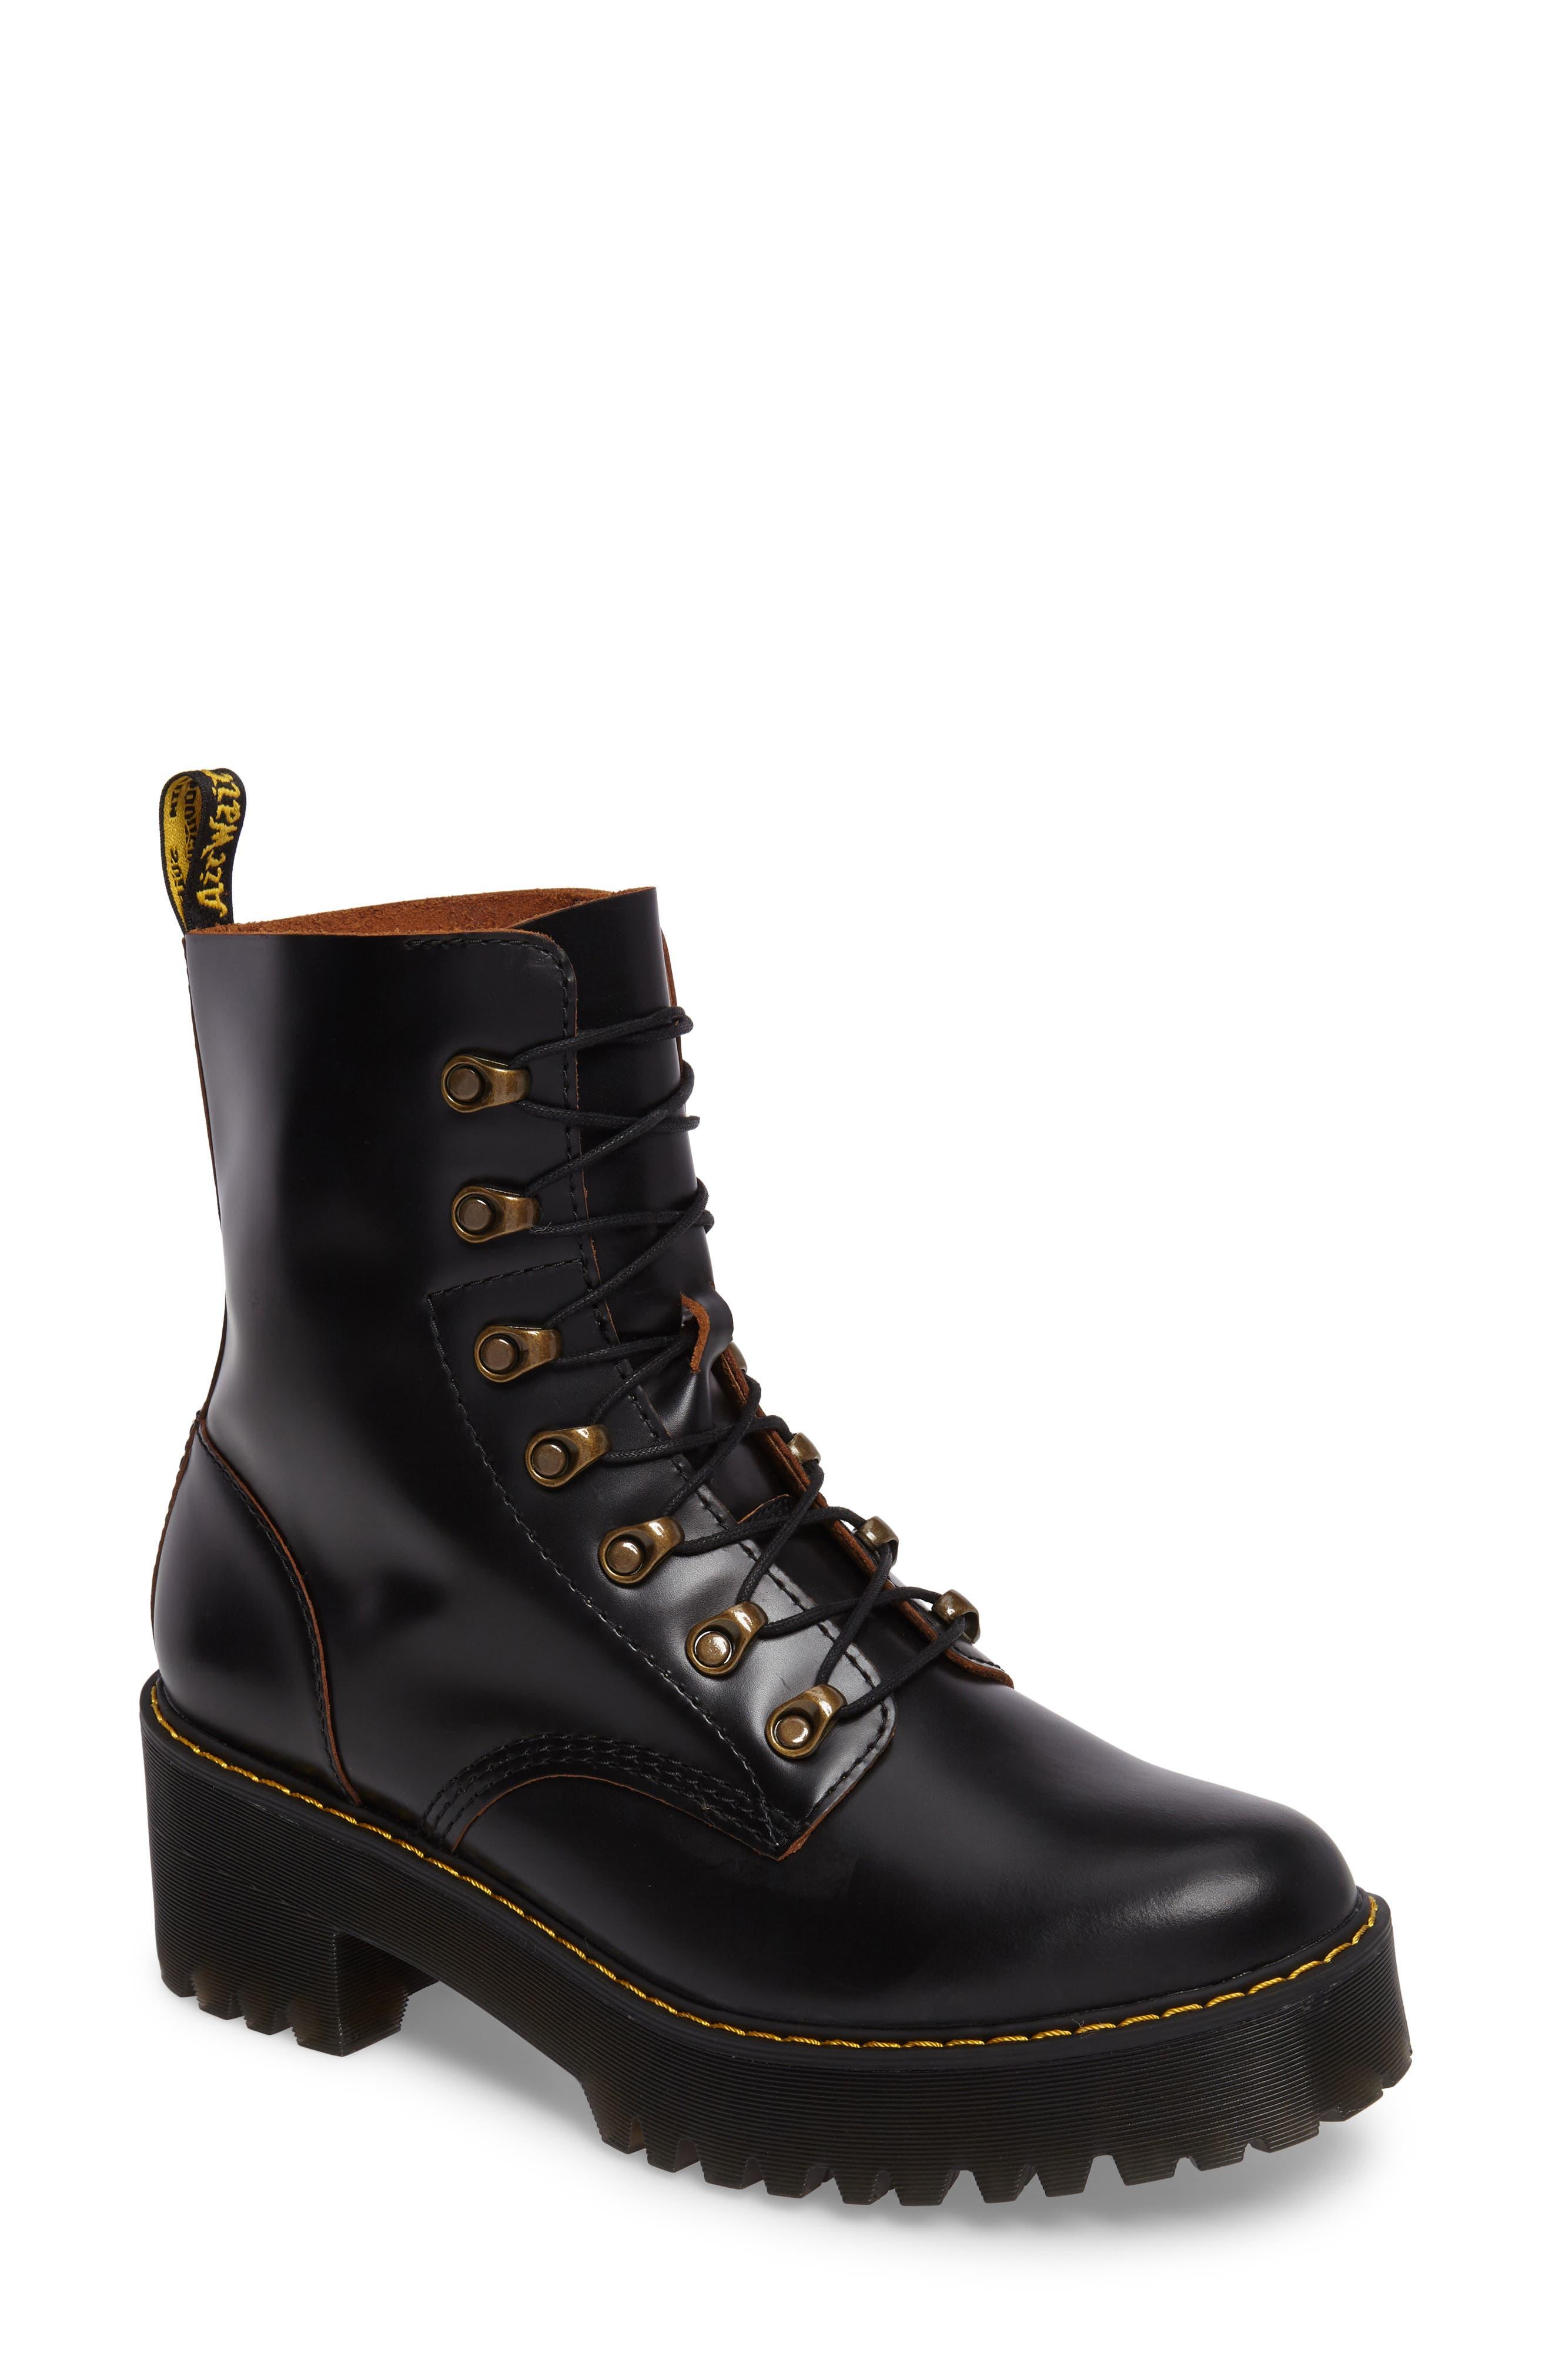 Leona Heeled Boot, Main, color, 001